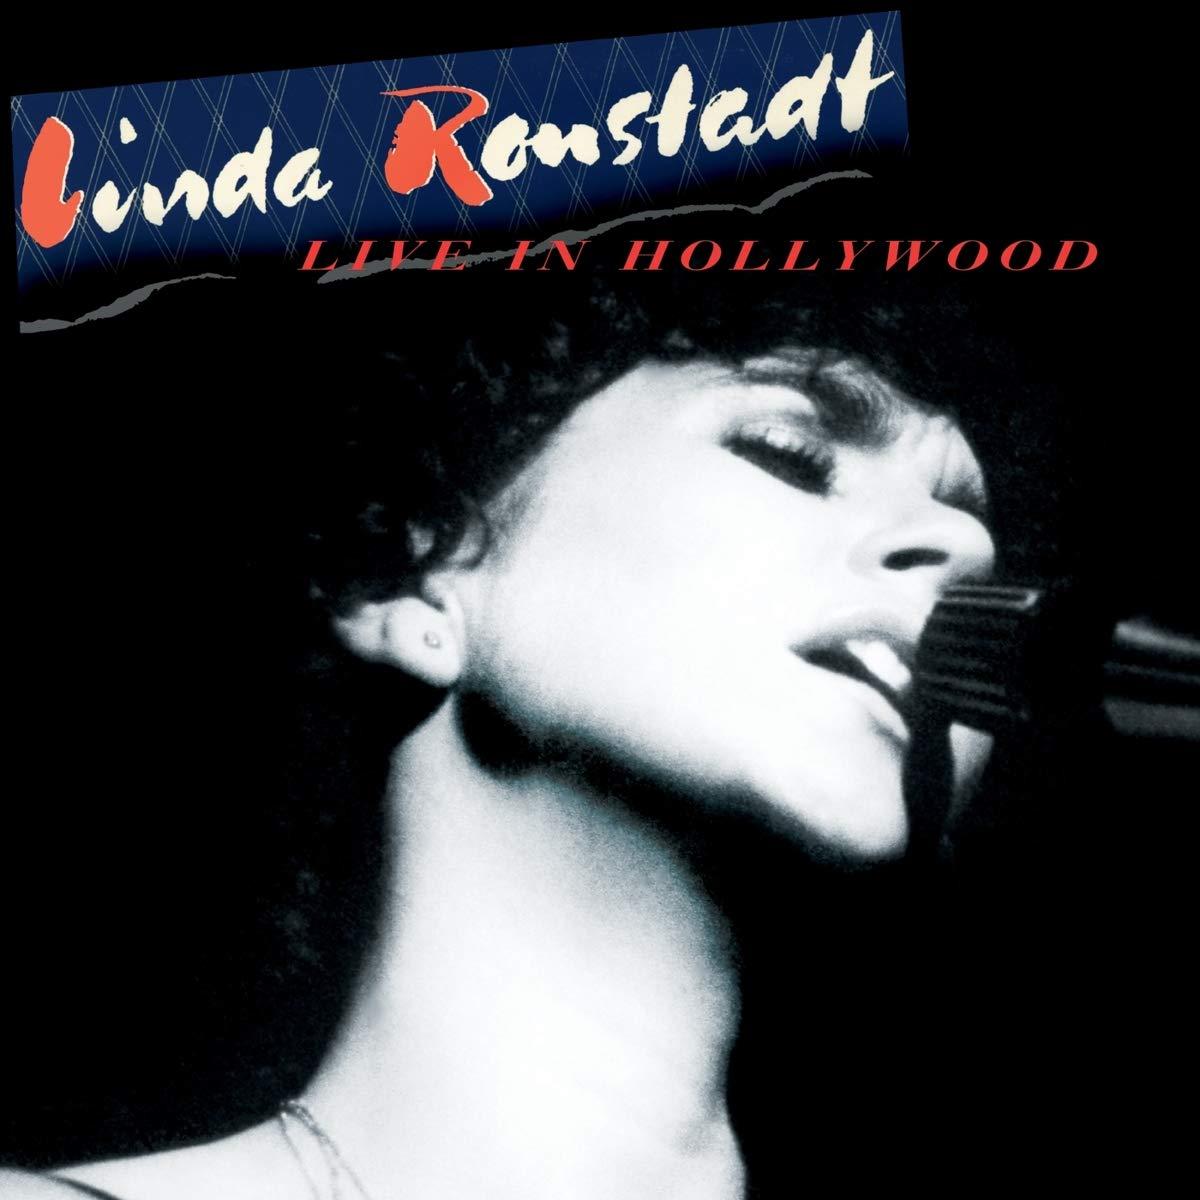 Linda Ronstadt. Live In Hollywood (LP) долли партон линда ронстадт эммилу харрис dolly parton linda ronstadt emmylou harris trio